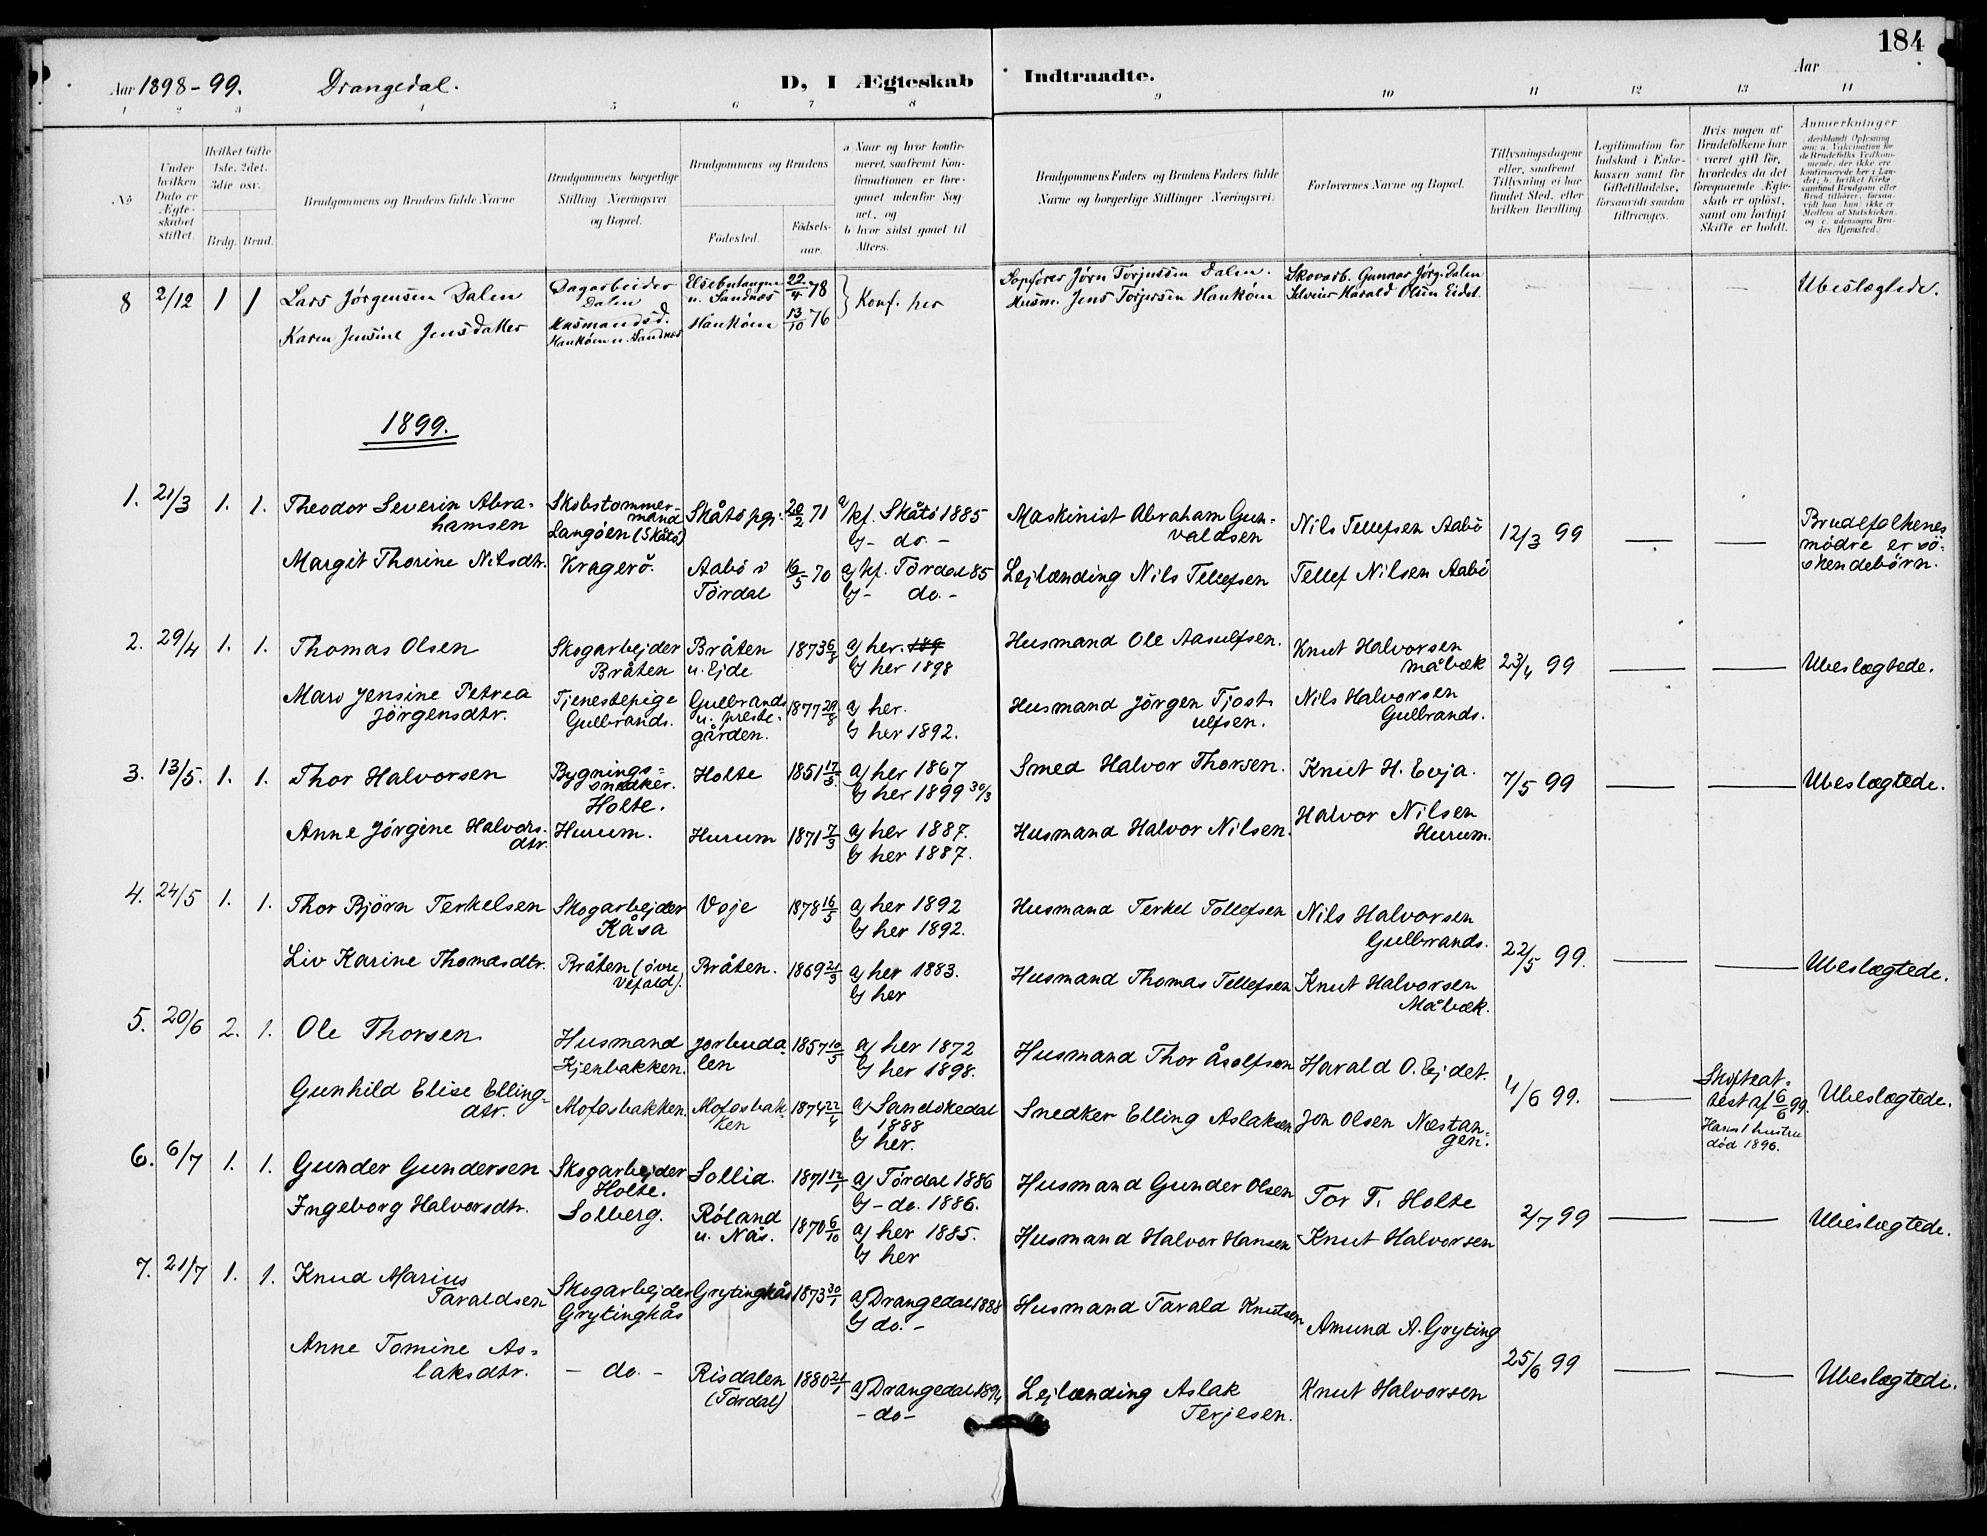 SAKO, Drangedal kirkebøker, F/Fa/L0012: Ministerialbok nr. 12, 1895-1905, s. 184